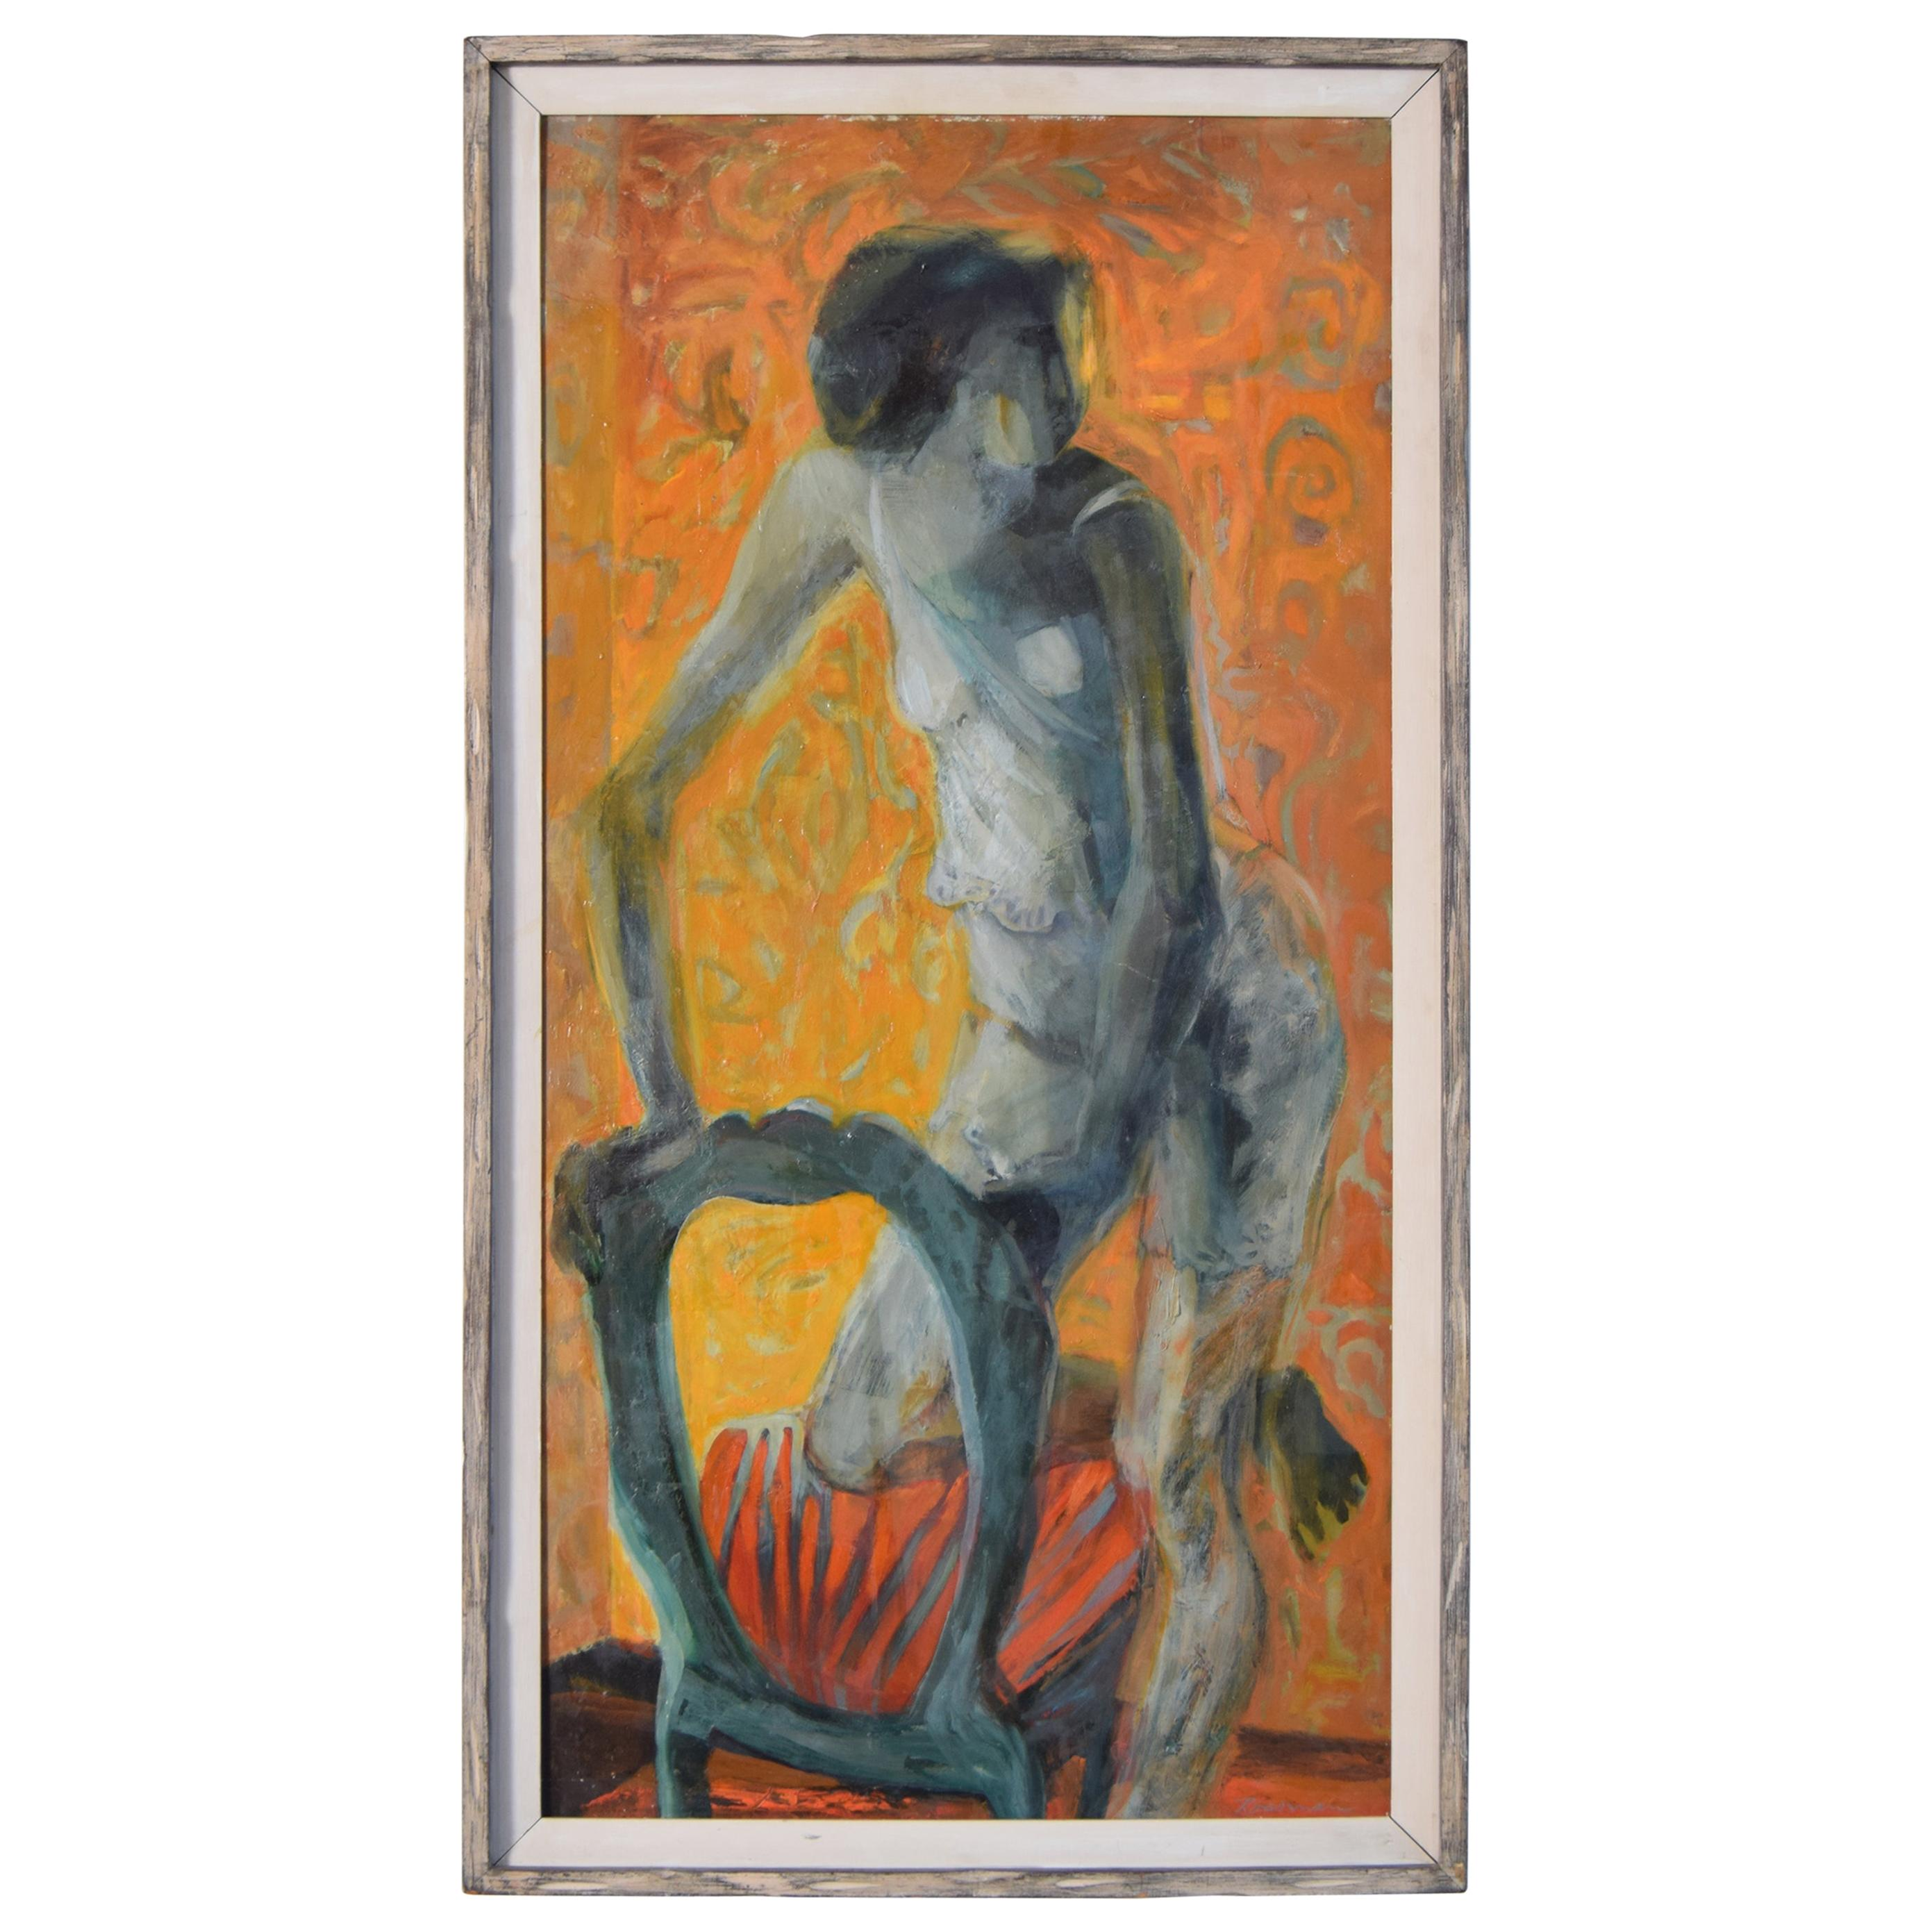 Modernist Oil Painting by Ruth Scharff Rossman